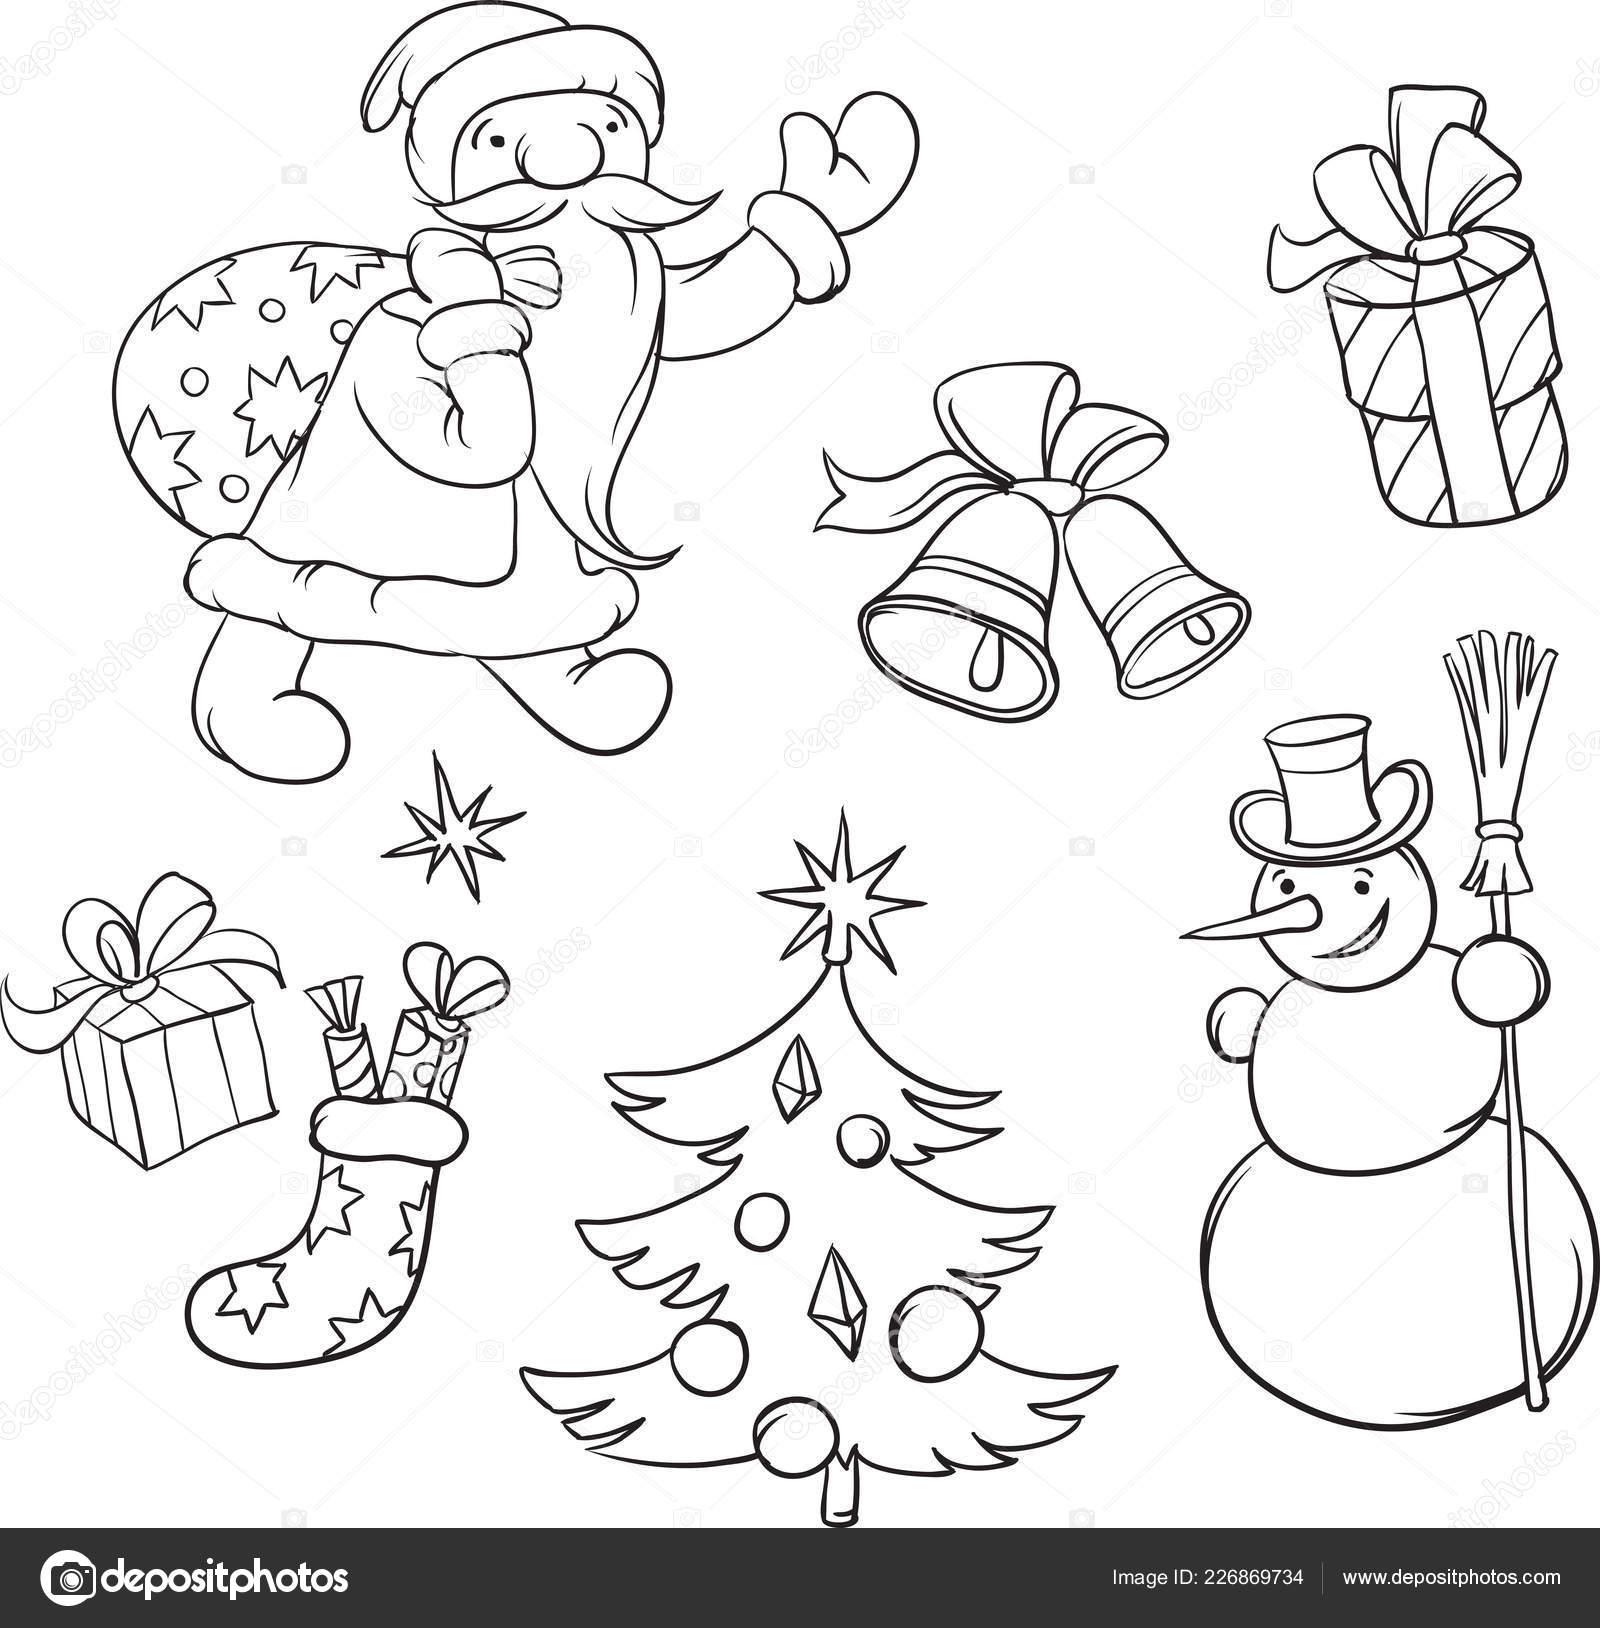 Ilustração Vetor Símbolos Livro Colorir Papai Noel Natal